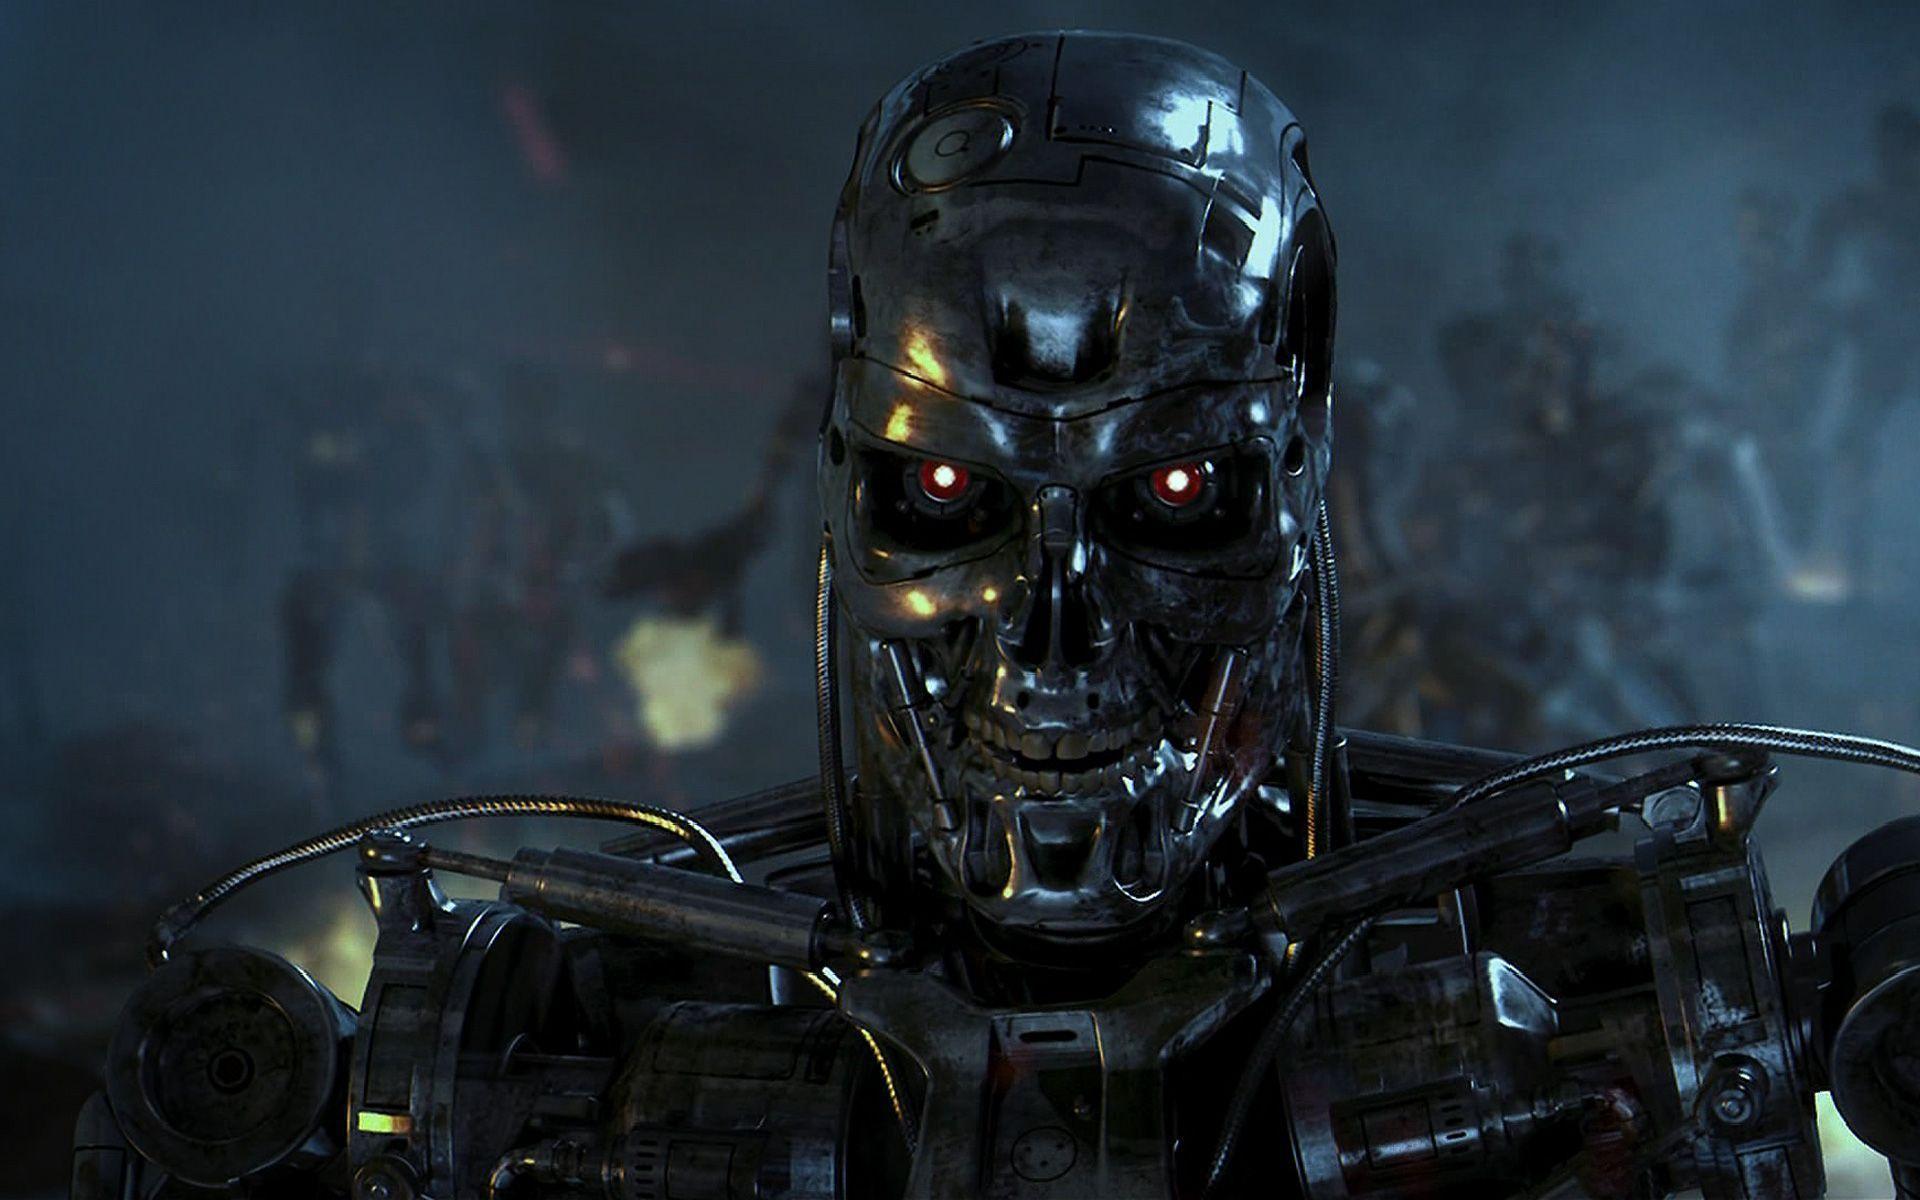 Terminator Wallpapers - Wallpaper Cave